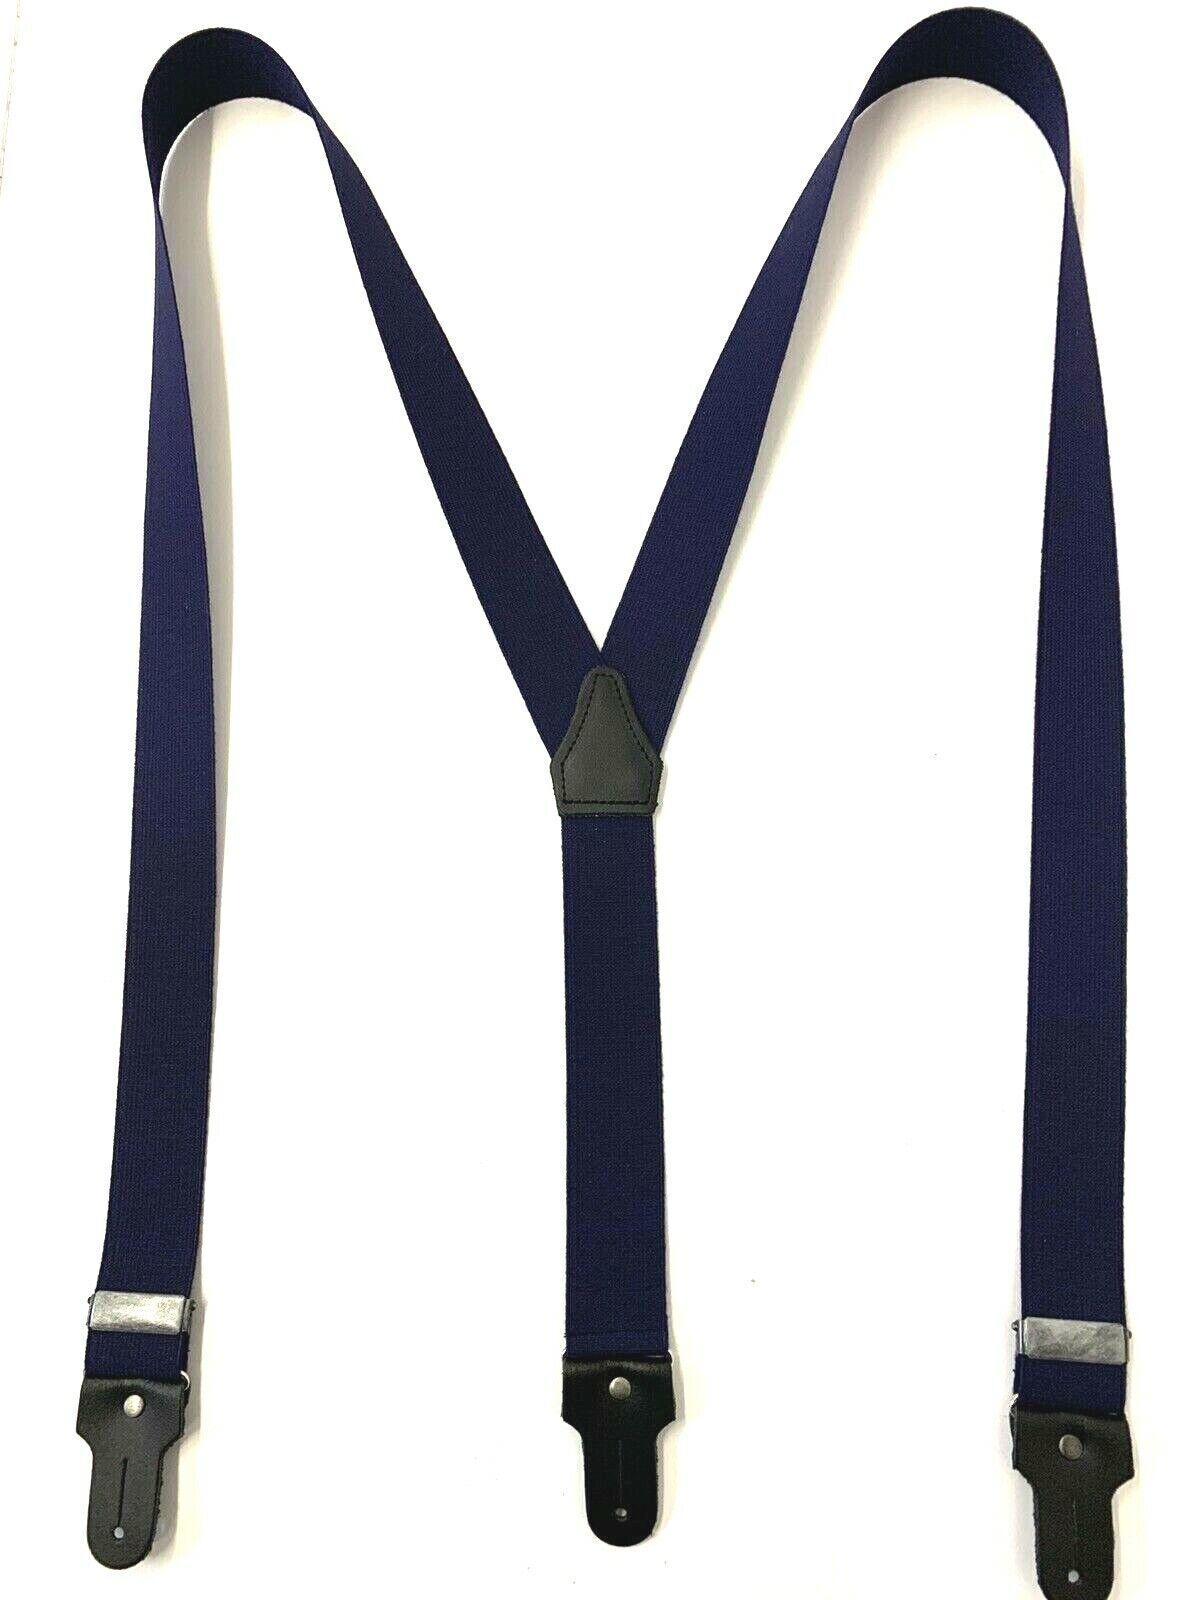 Sonderaktion Hosenträger 3 Knopflöcher blau mit echtem Leder 120cm Top Art.100